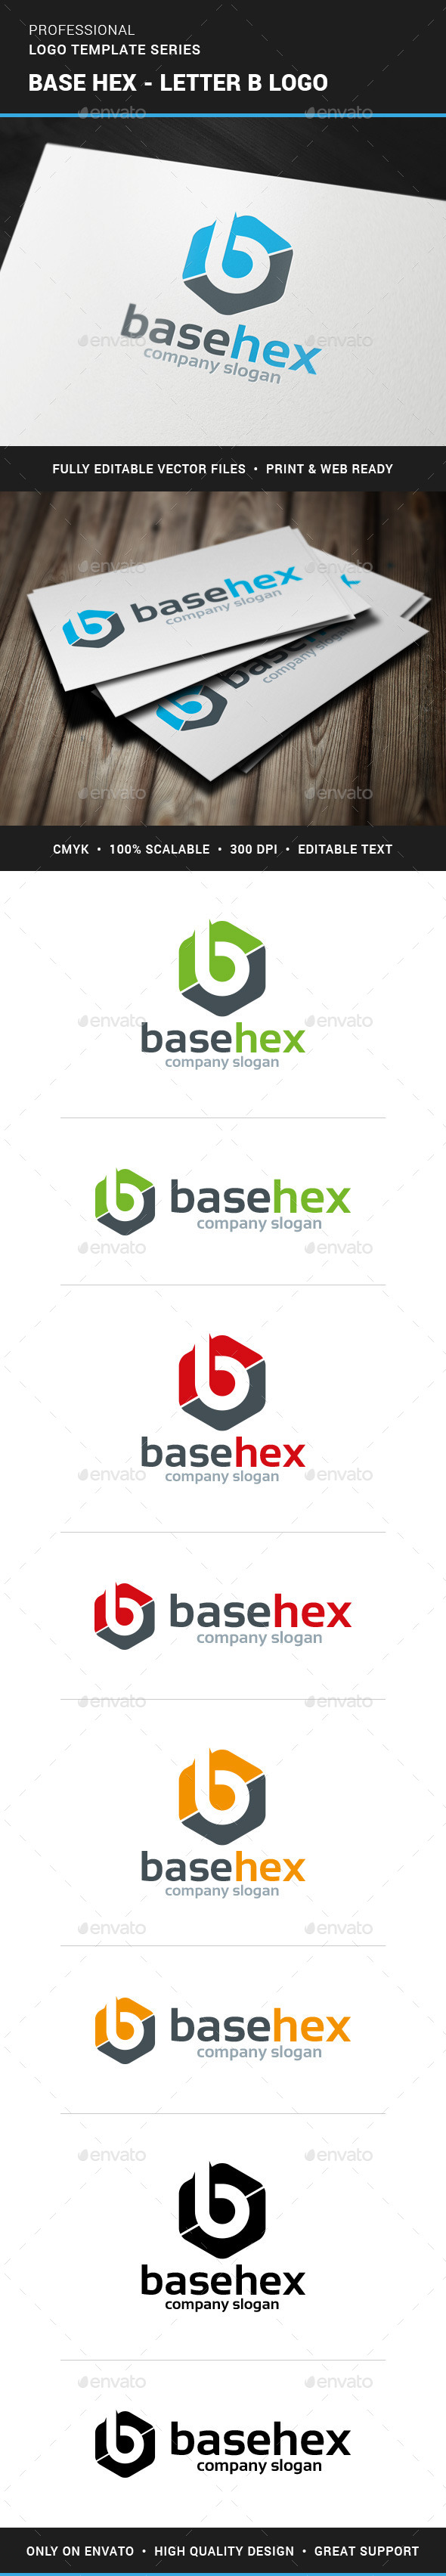 GraphicRiver Base Hex Letter B Logo 11395364